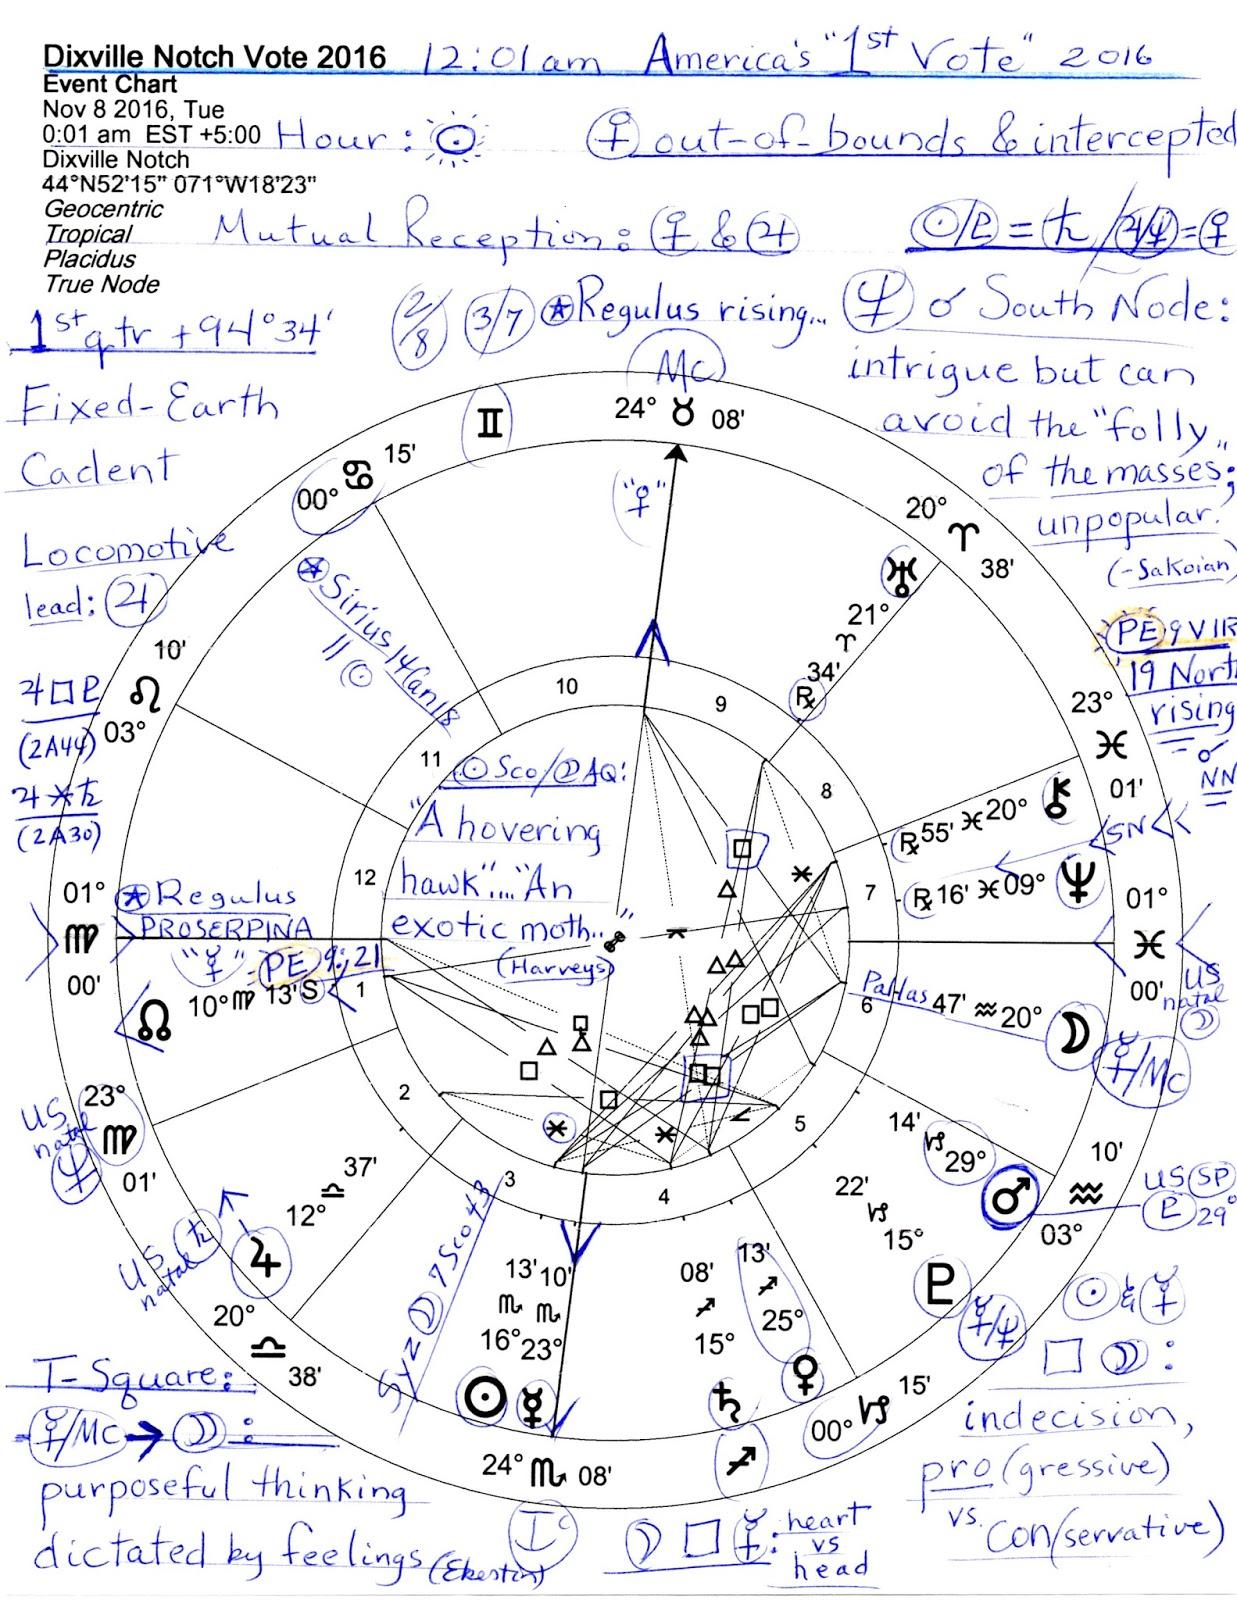 Stars over washington july 2015 horoscope dixville notch nh first vote november 8 2016 1201 am est 1st quarter lunar phase crisis in action nvjuhfo Images